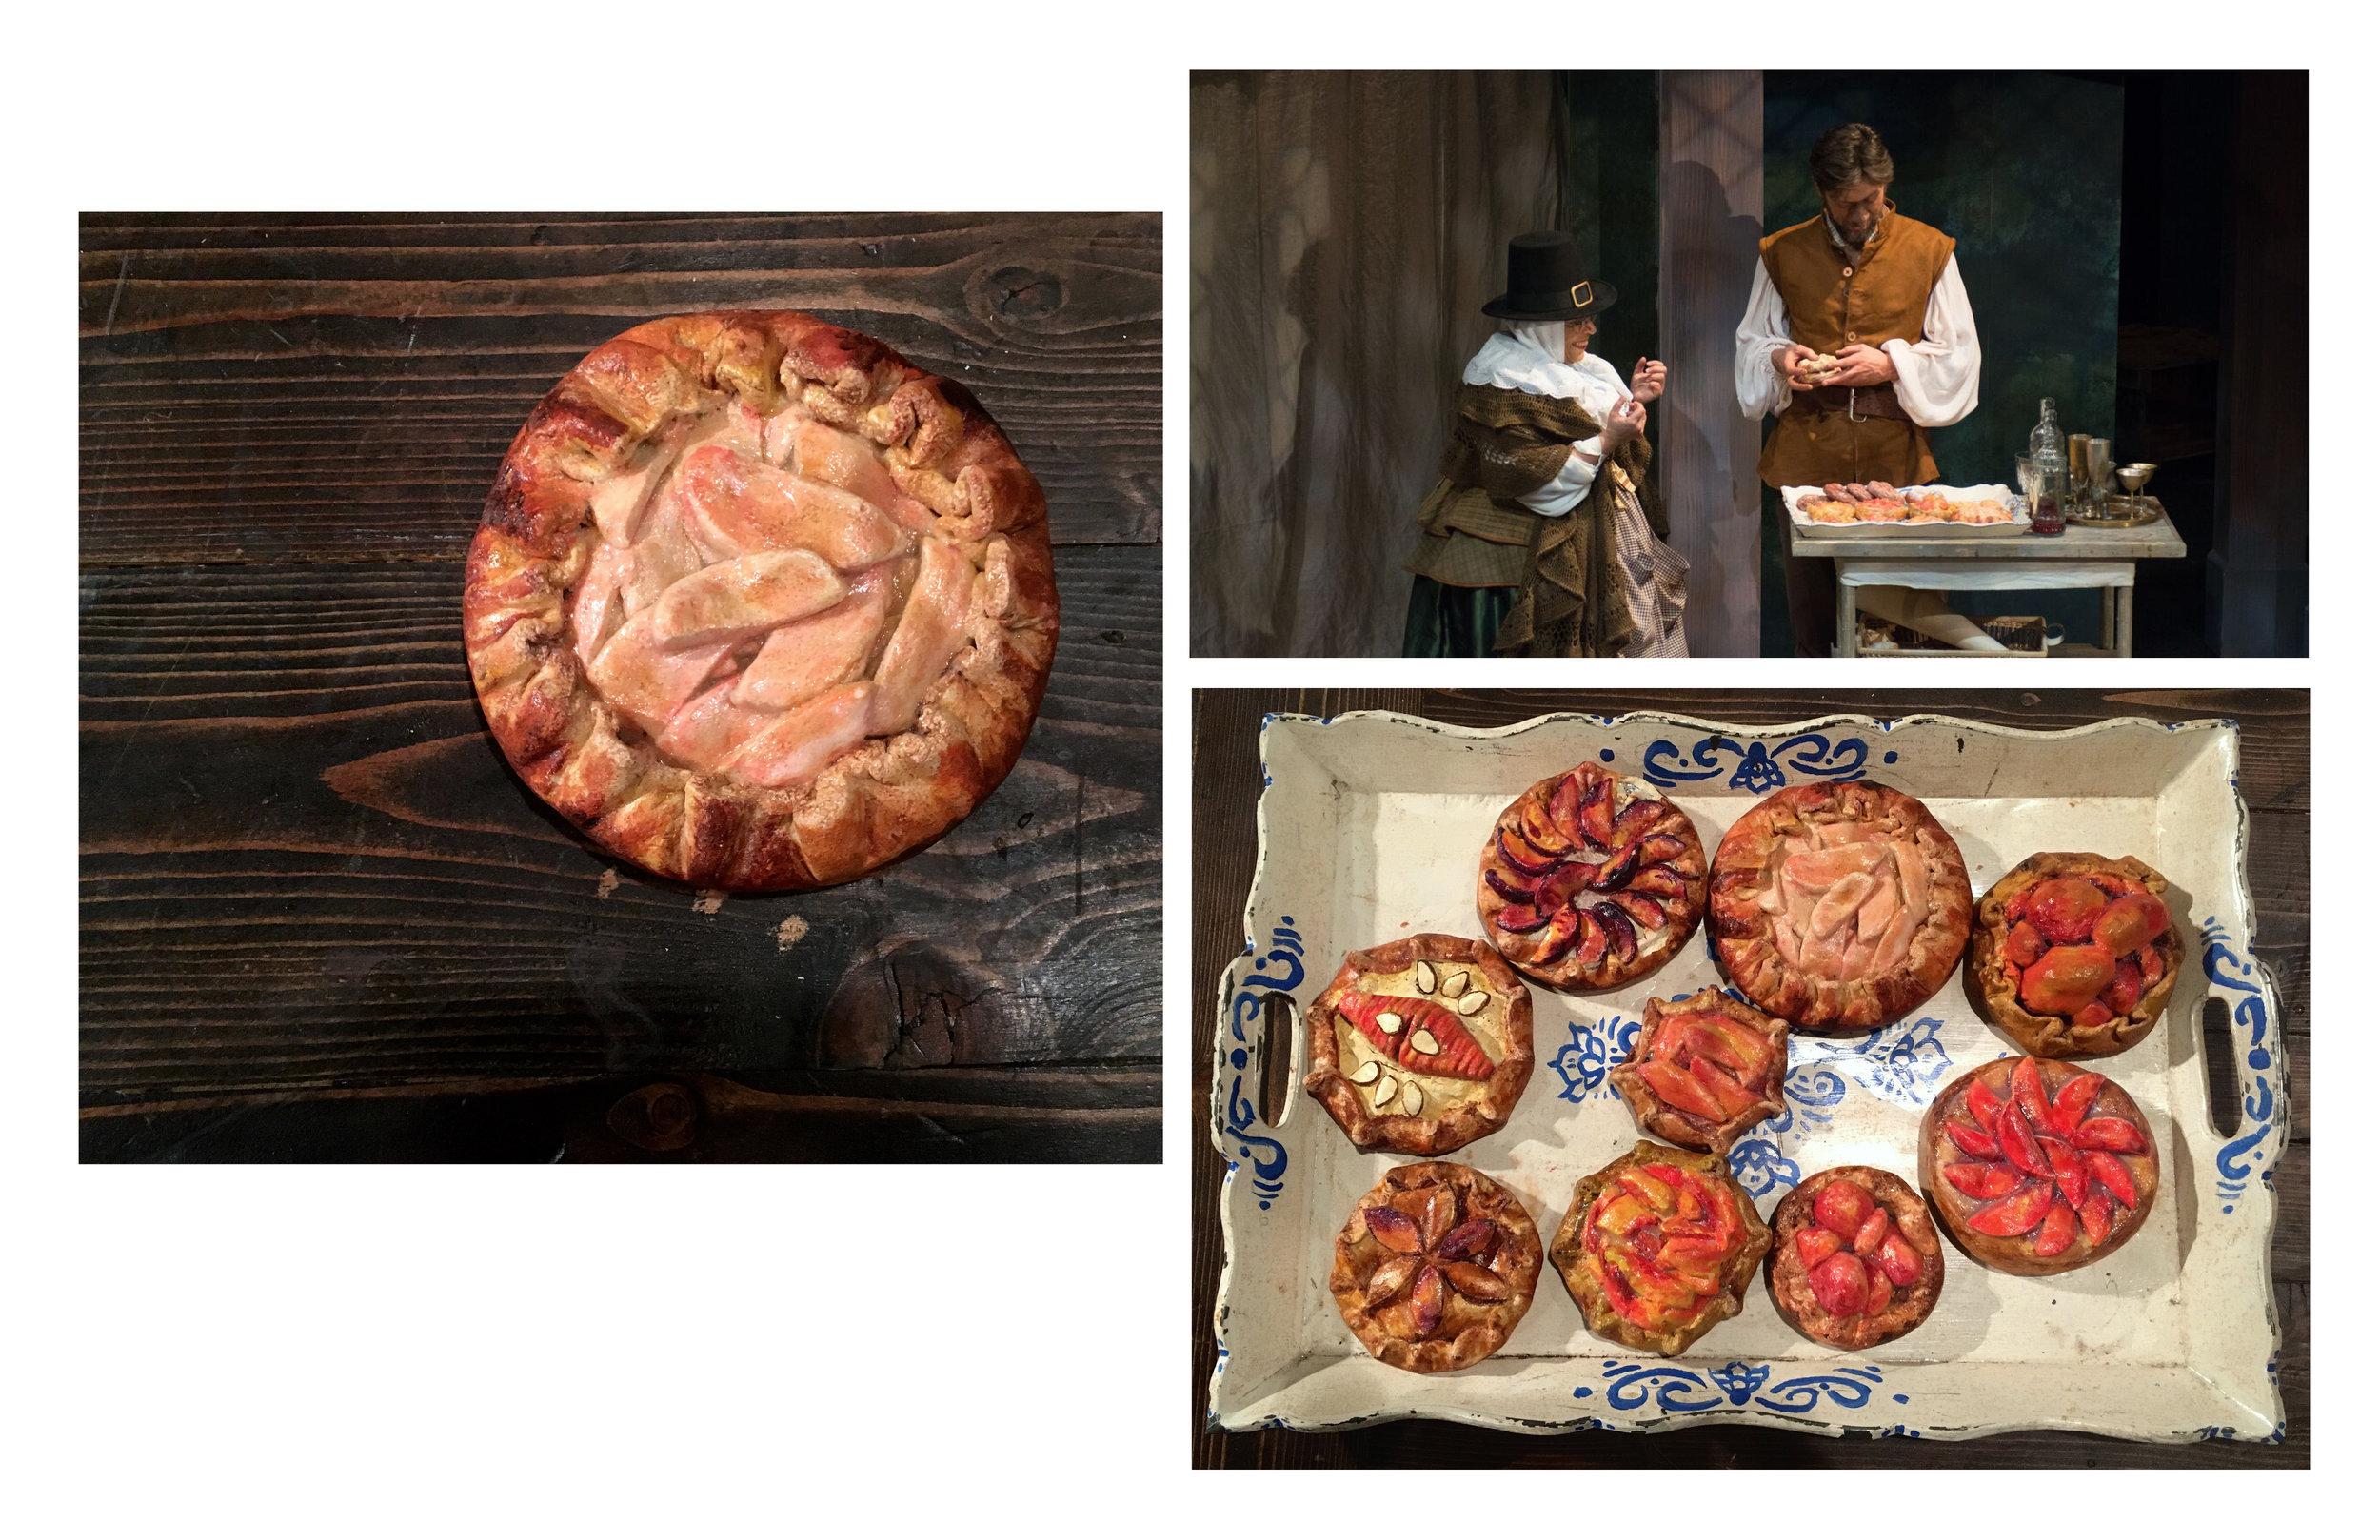 Platter of pies